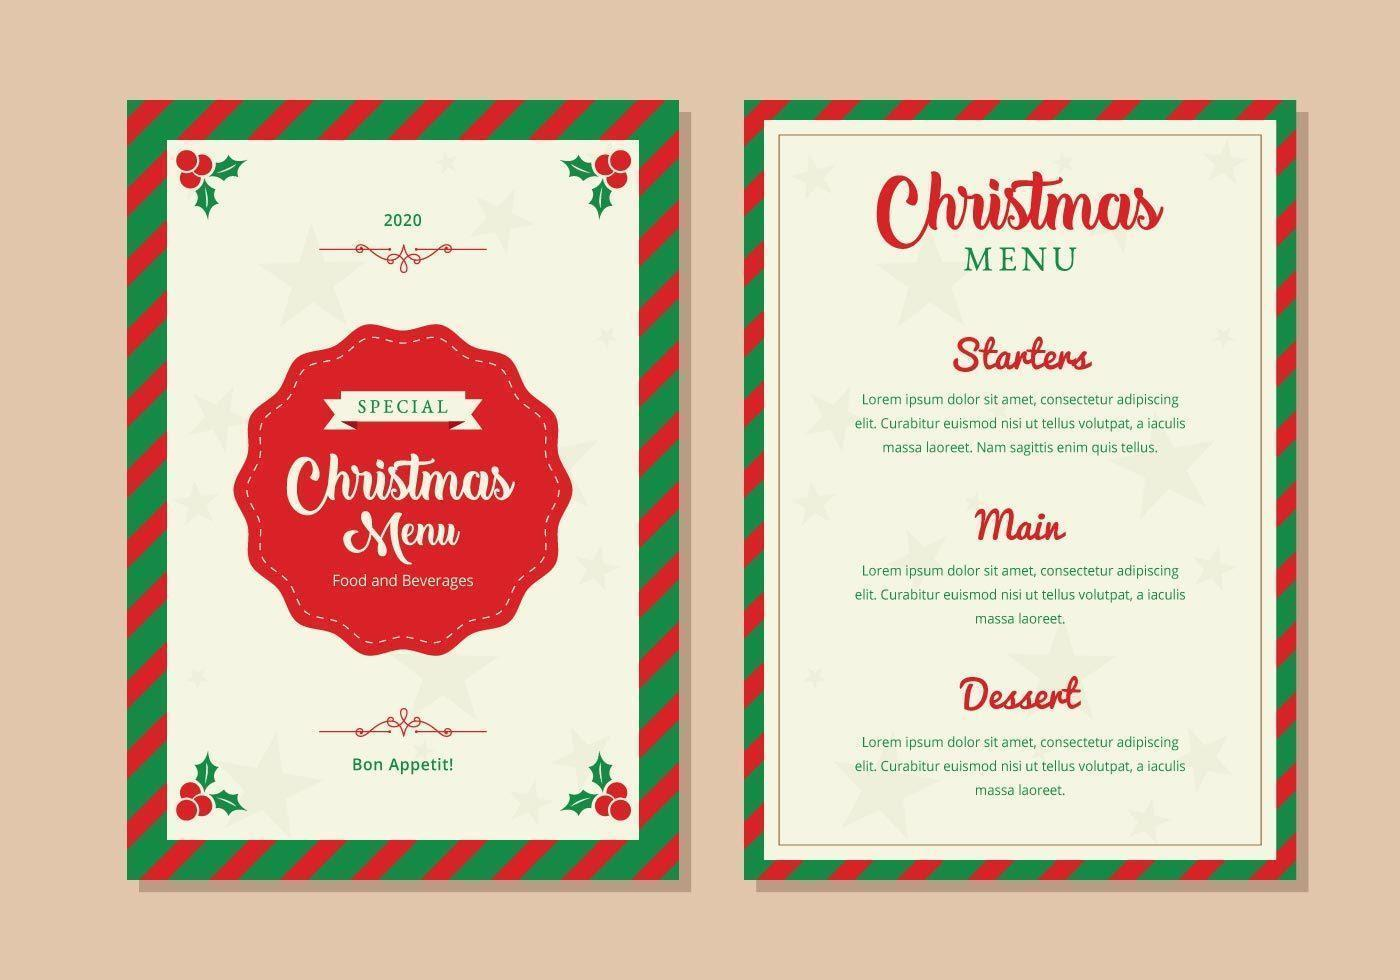 menu para navidad 2020